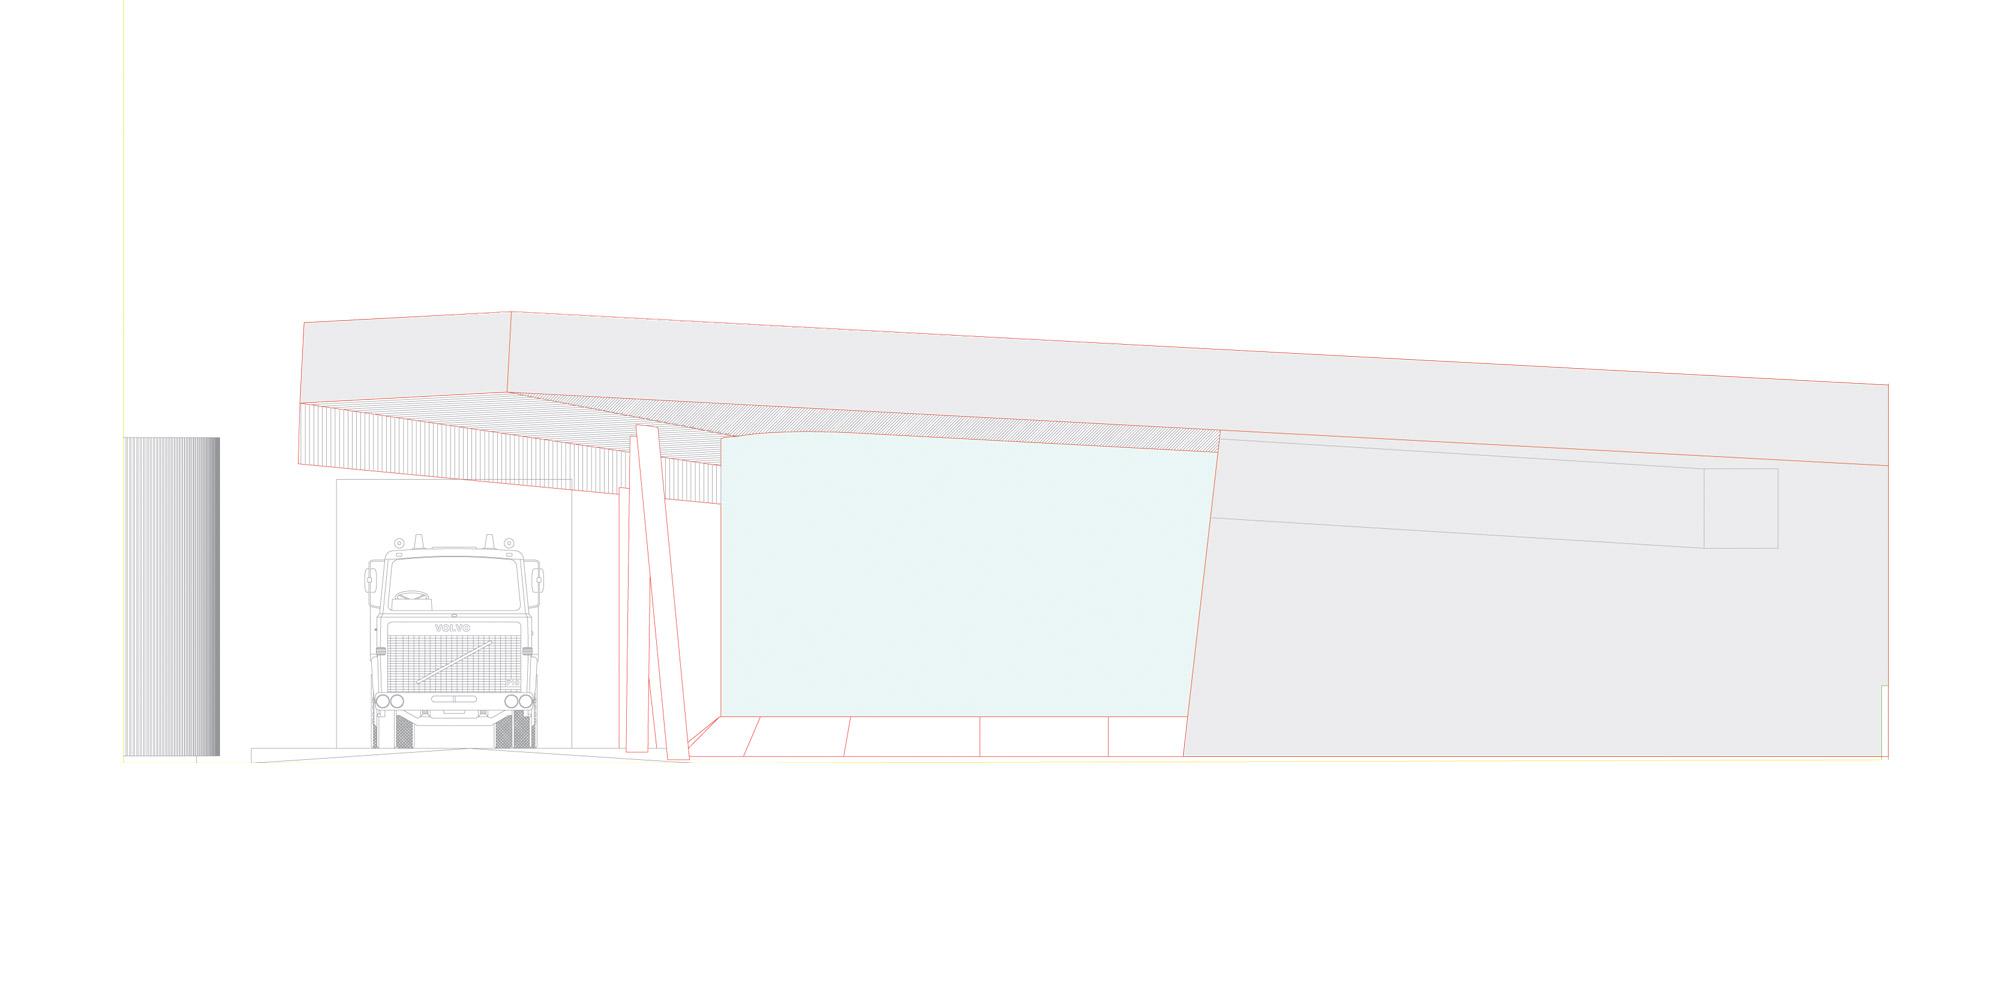 East elevation © Studio Seilern Architects